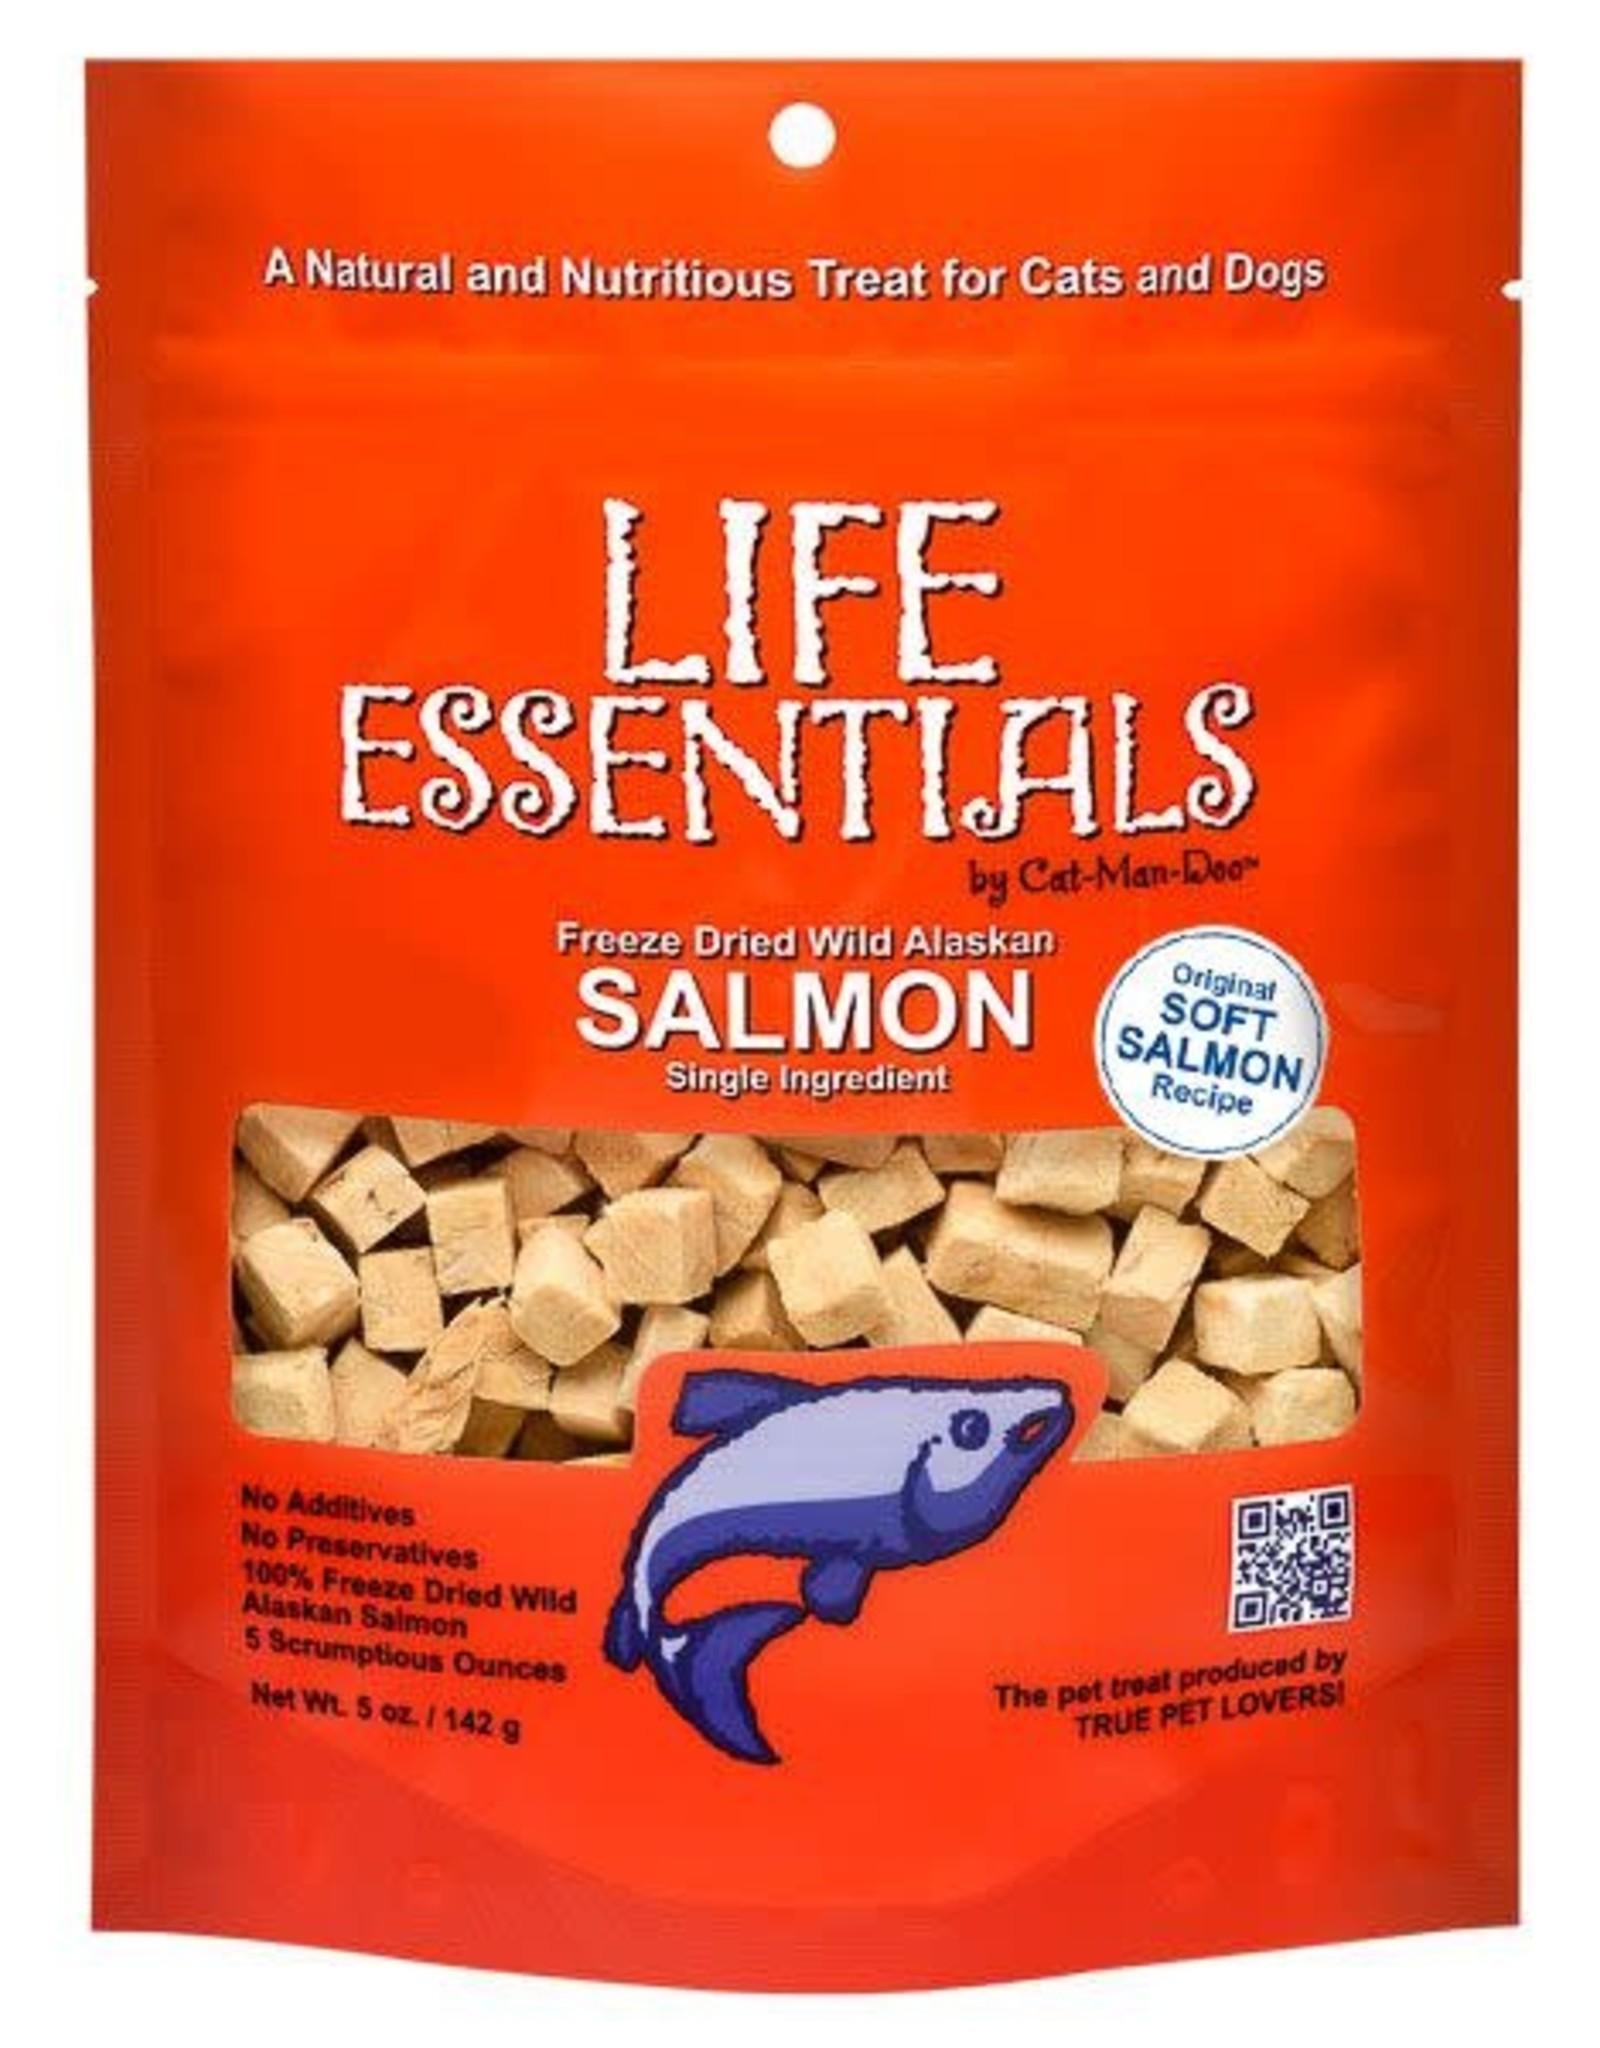 Cat-Man-Doo Cat-Man-Doo Life Essentials Freeze Dried Salmon Cubes 2oz